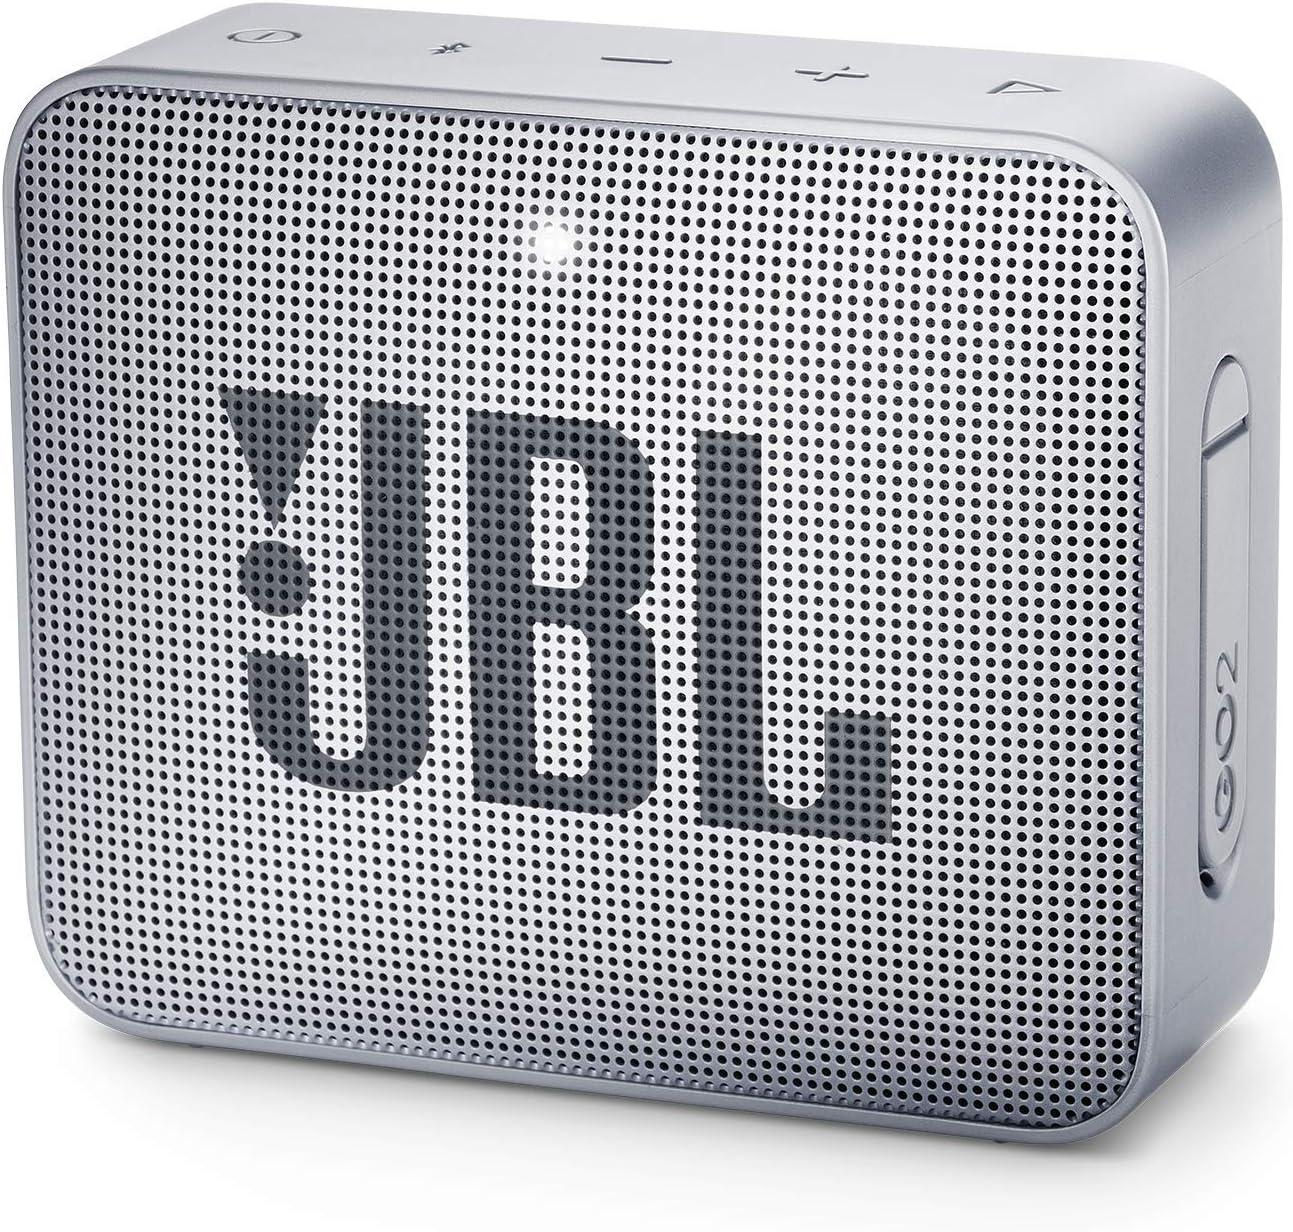 JBL GO2BLU Go 2 Portable Bluetooth Waterproof Speaker Deep Sea Blue 4.3 x 4.5 x 1.5